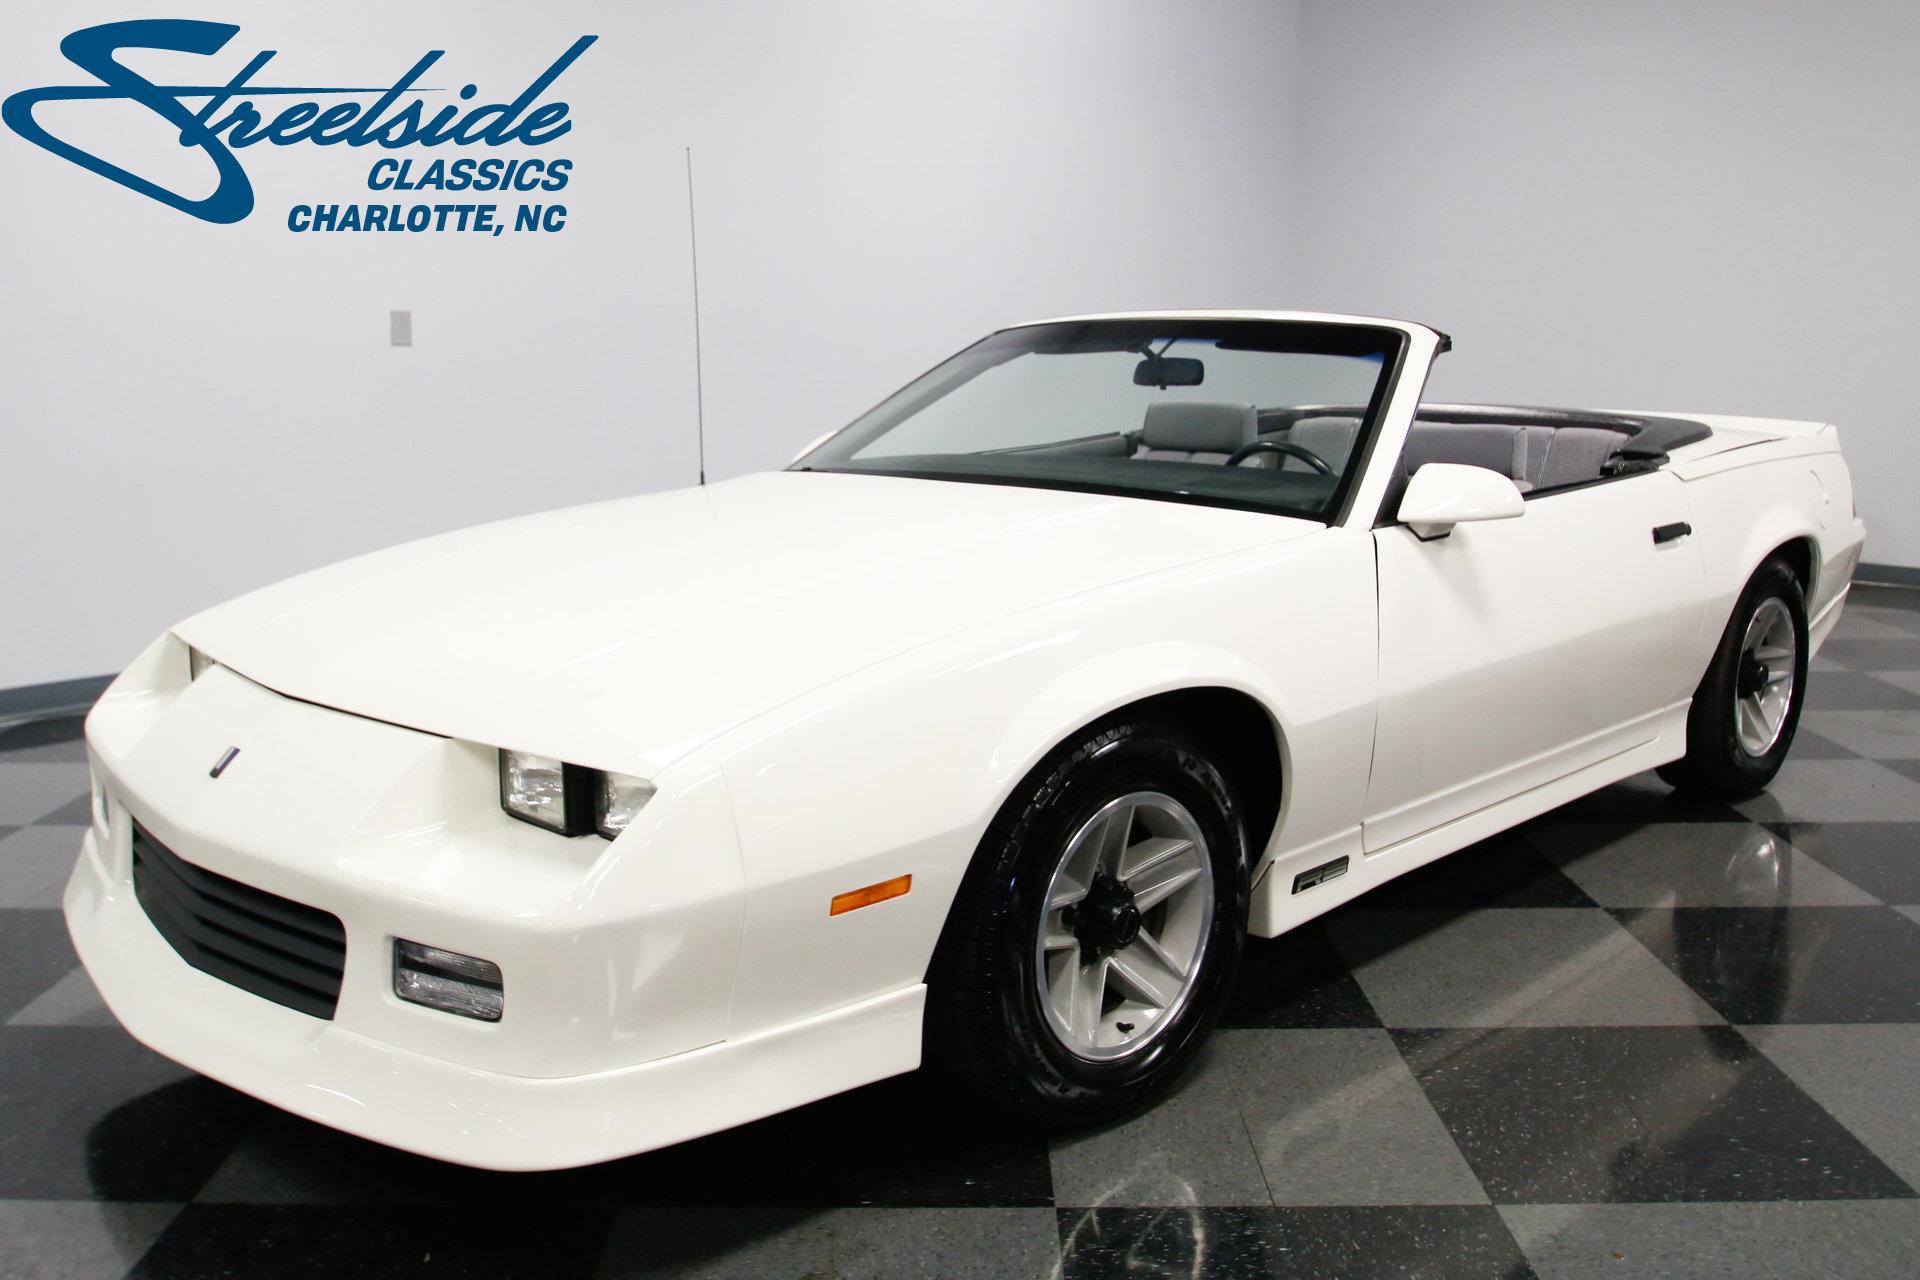 1989 Chevrolet Camaro Streetside Classics Classic Amp Exotic Car Consignment Dealer